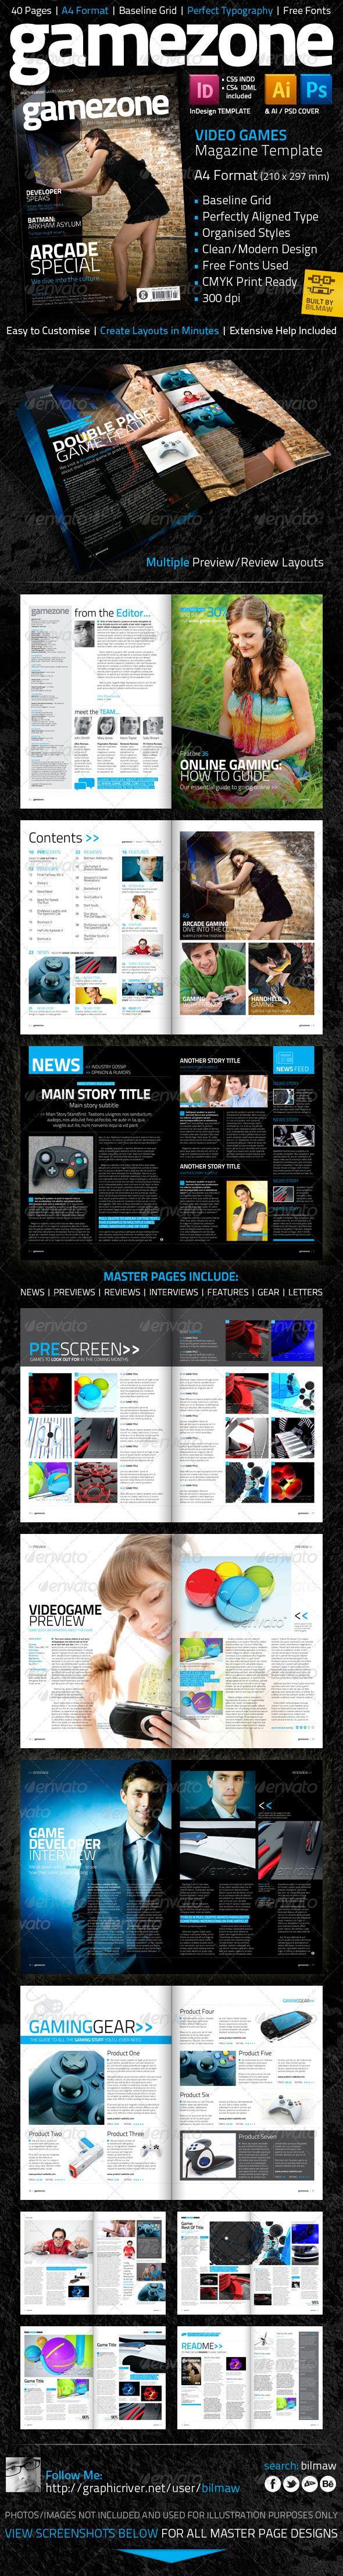 Video Game Magazine Template - Magazines Print Templates